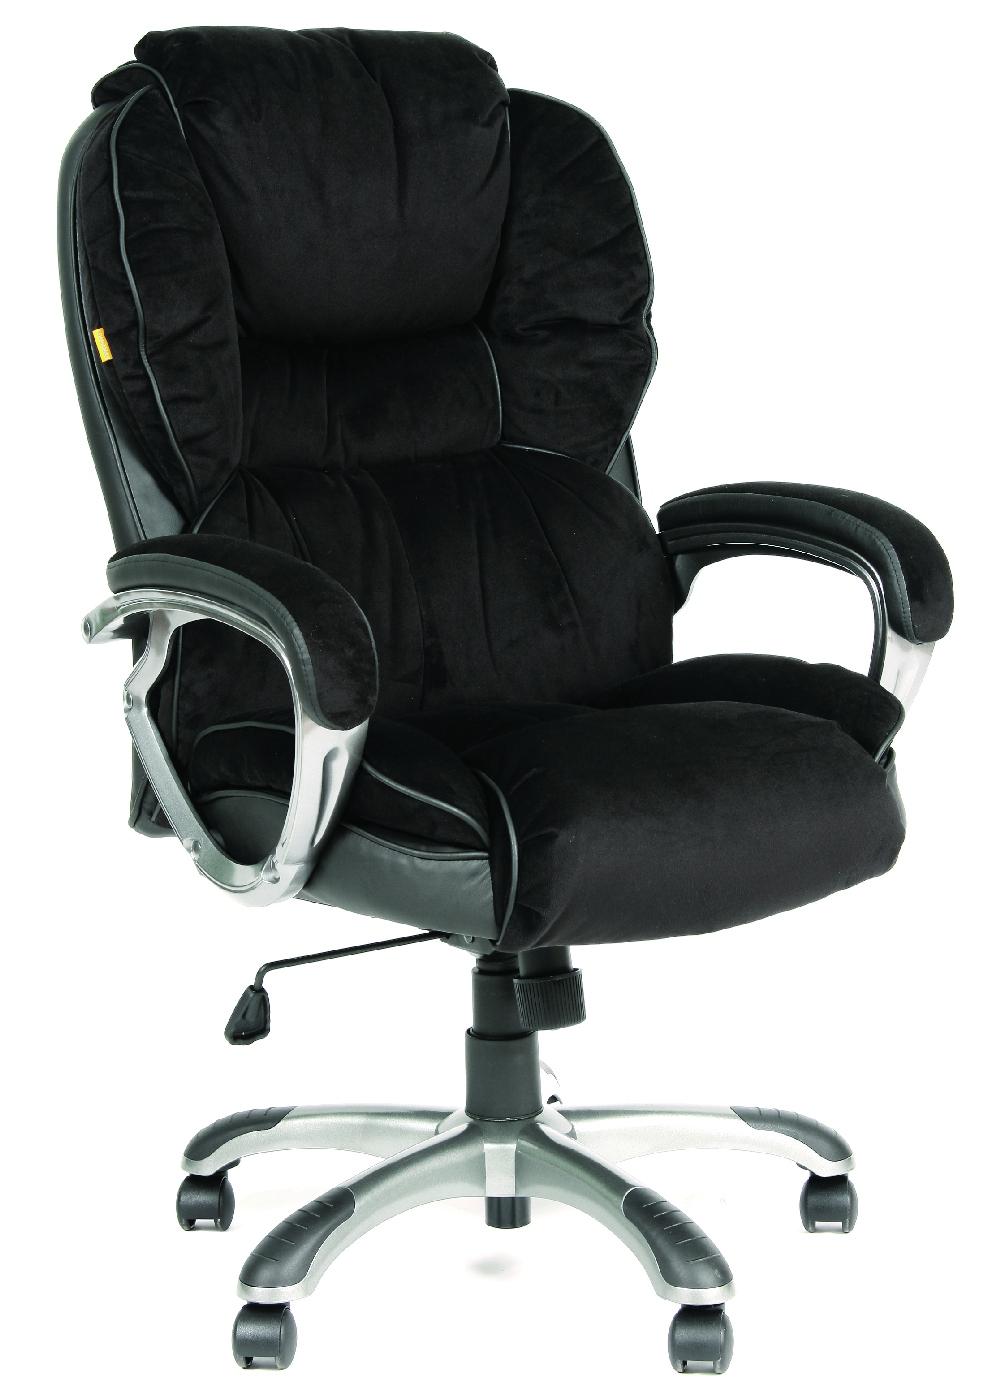 Кресло руководителя CH-434 черная ткань, Chairman 434